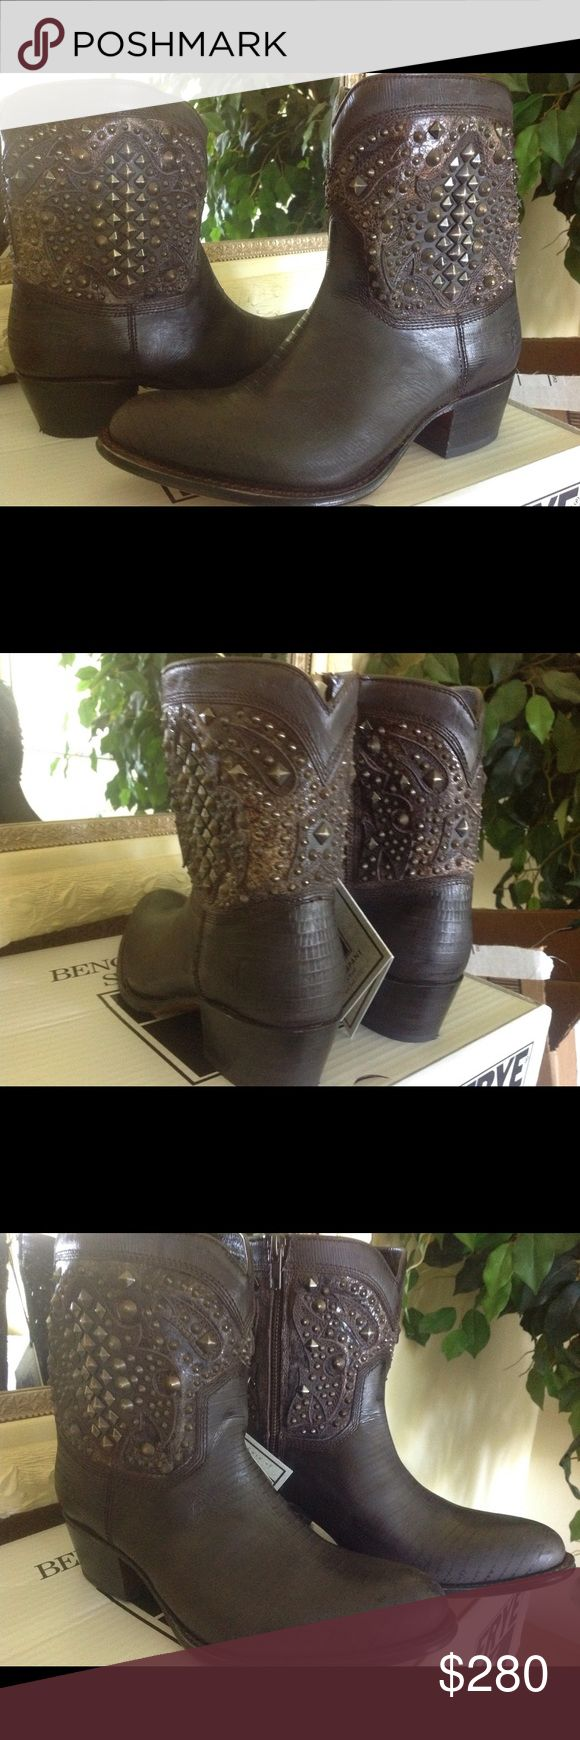 Frye Deborah Deco Boot Frye Deborah Deco Short Studded Dark Brown Leather Boots w/zip.  Brand new w/box.  No trades. Frye Shoes Ankle Boots & Booties